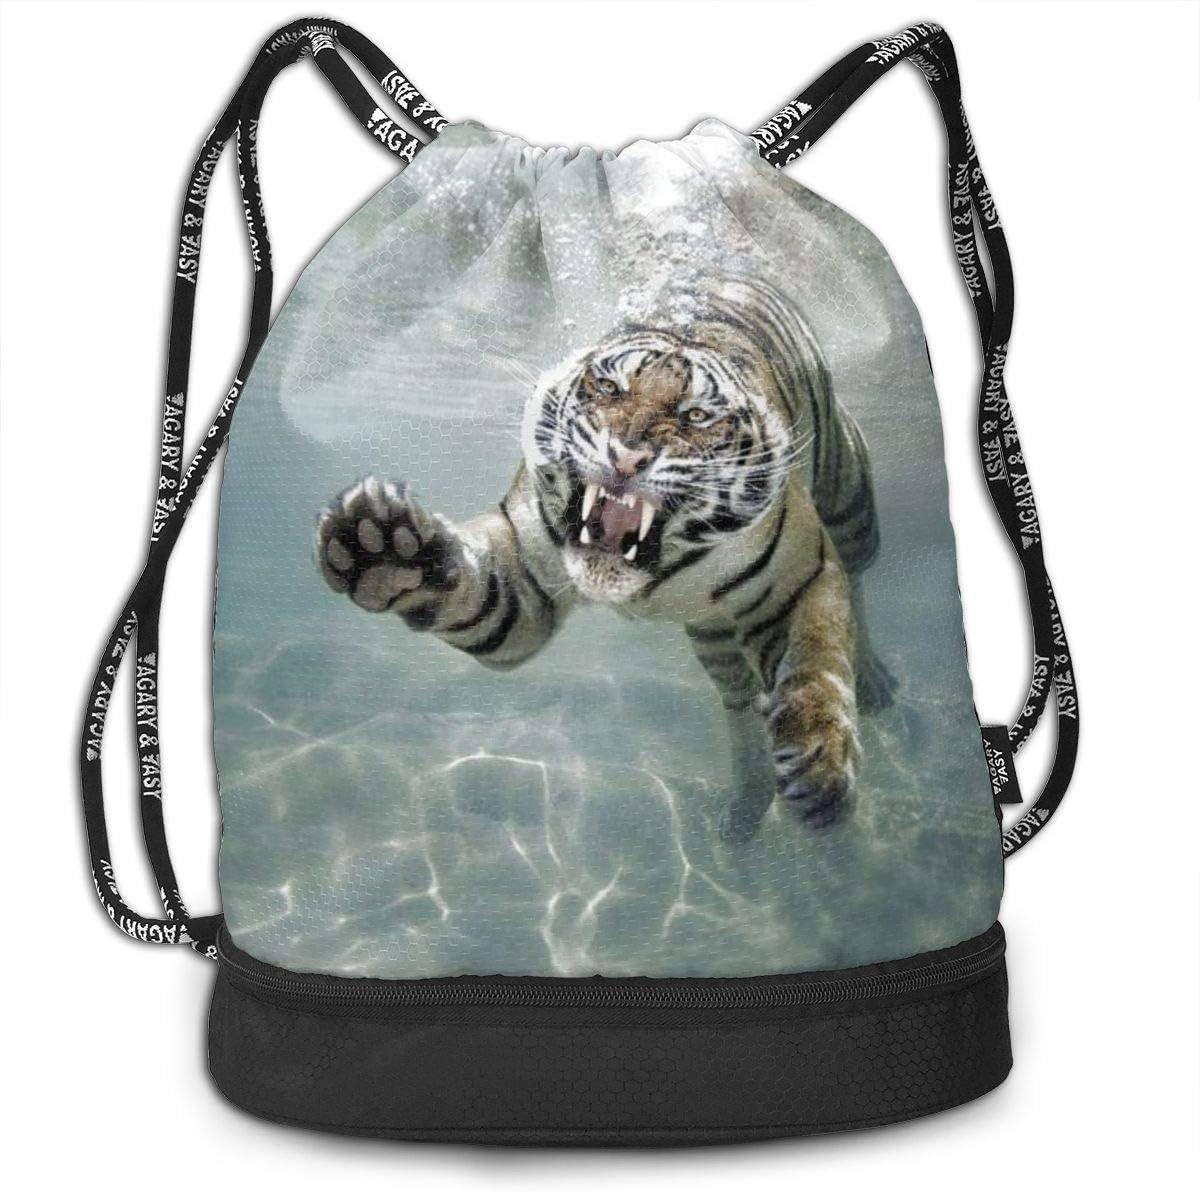 GymSack Drawstring Bag Sackpack Underwater White Tiger Sport Cinch Pack Simple Bundle Pocke Backpack For Men Women